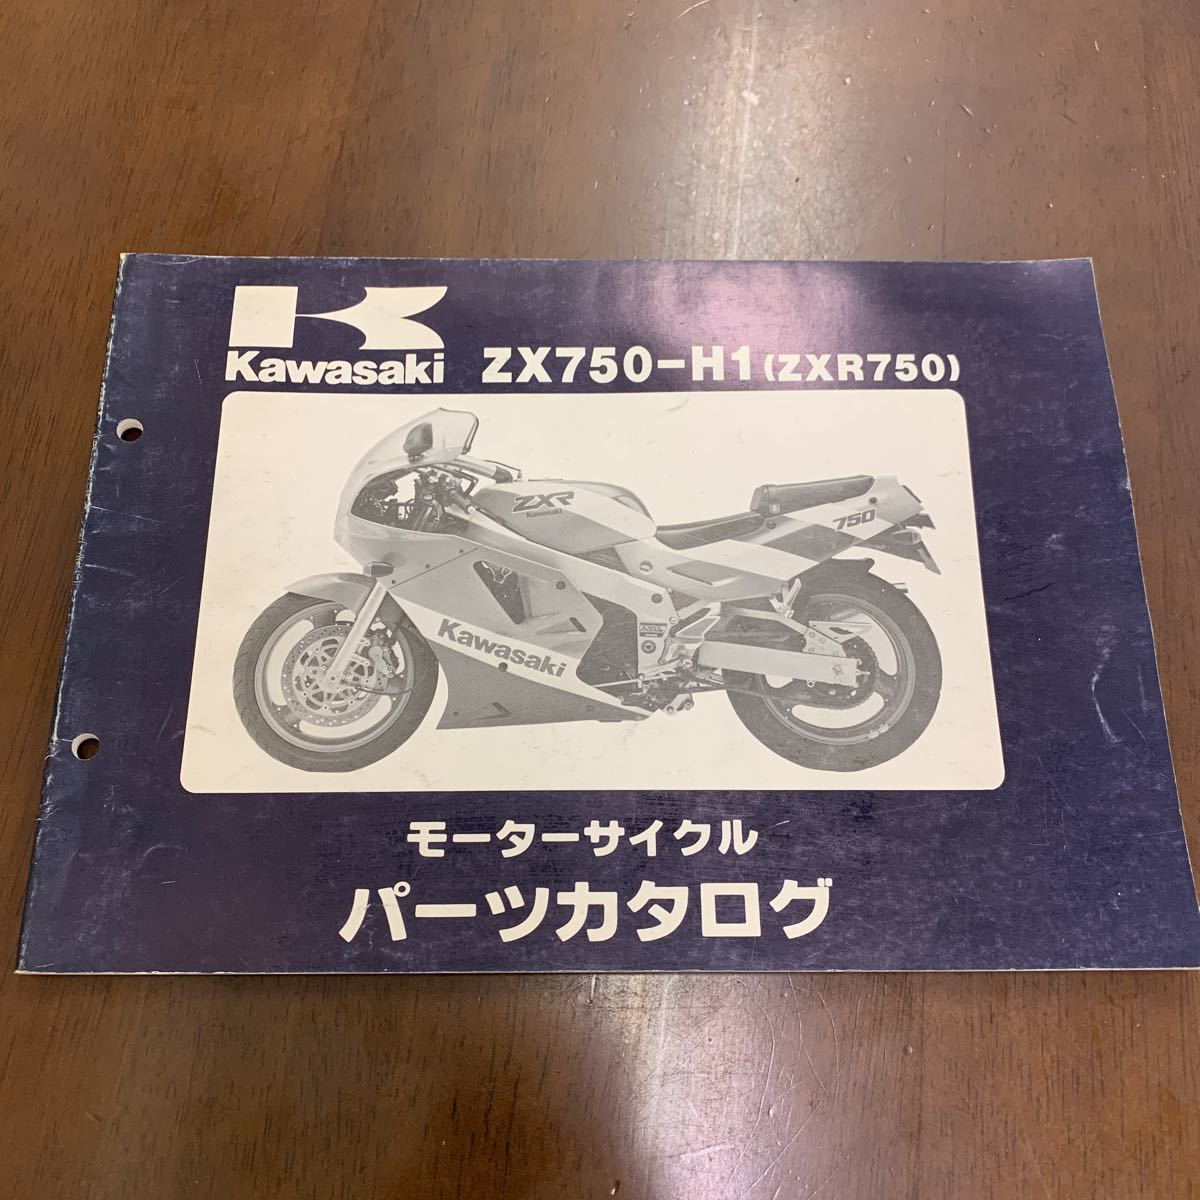 ZXR750 パーツリスト パーツカタログ カワサキ KAWASAKI _画像1